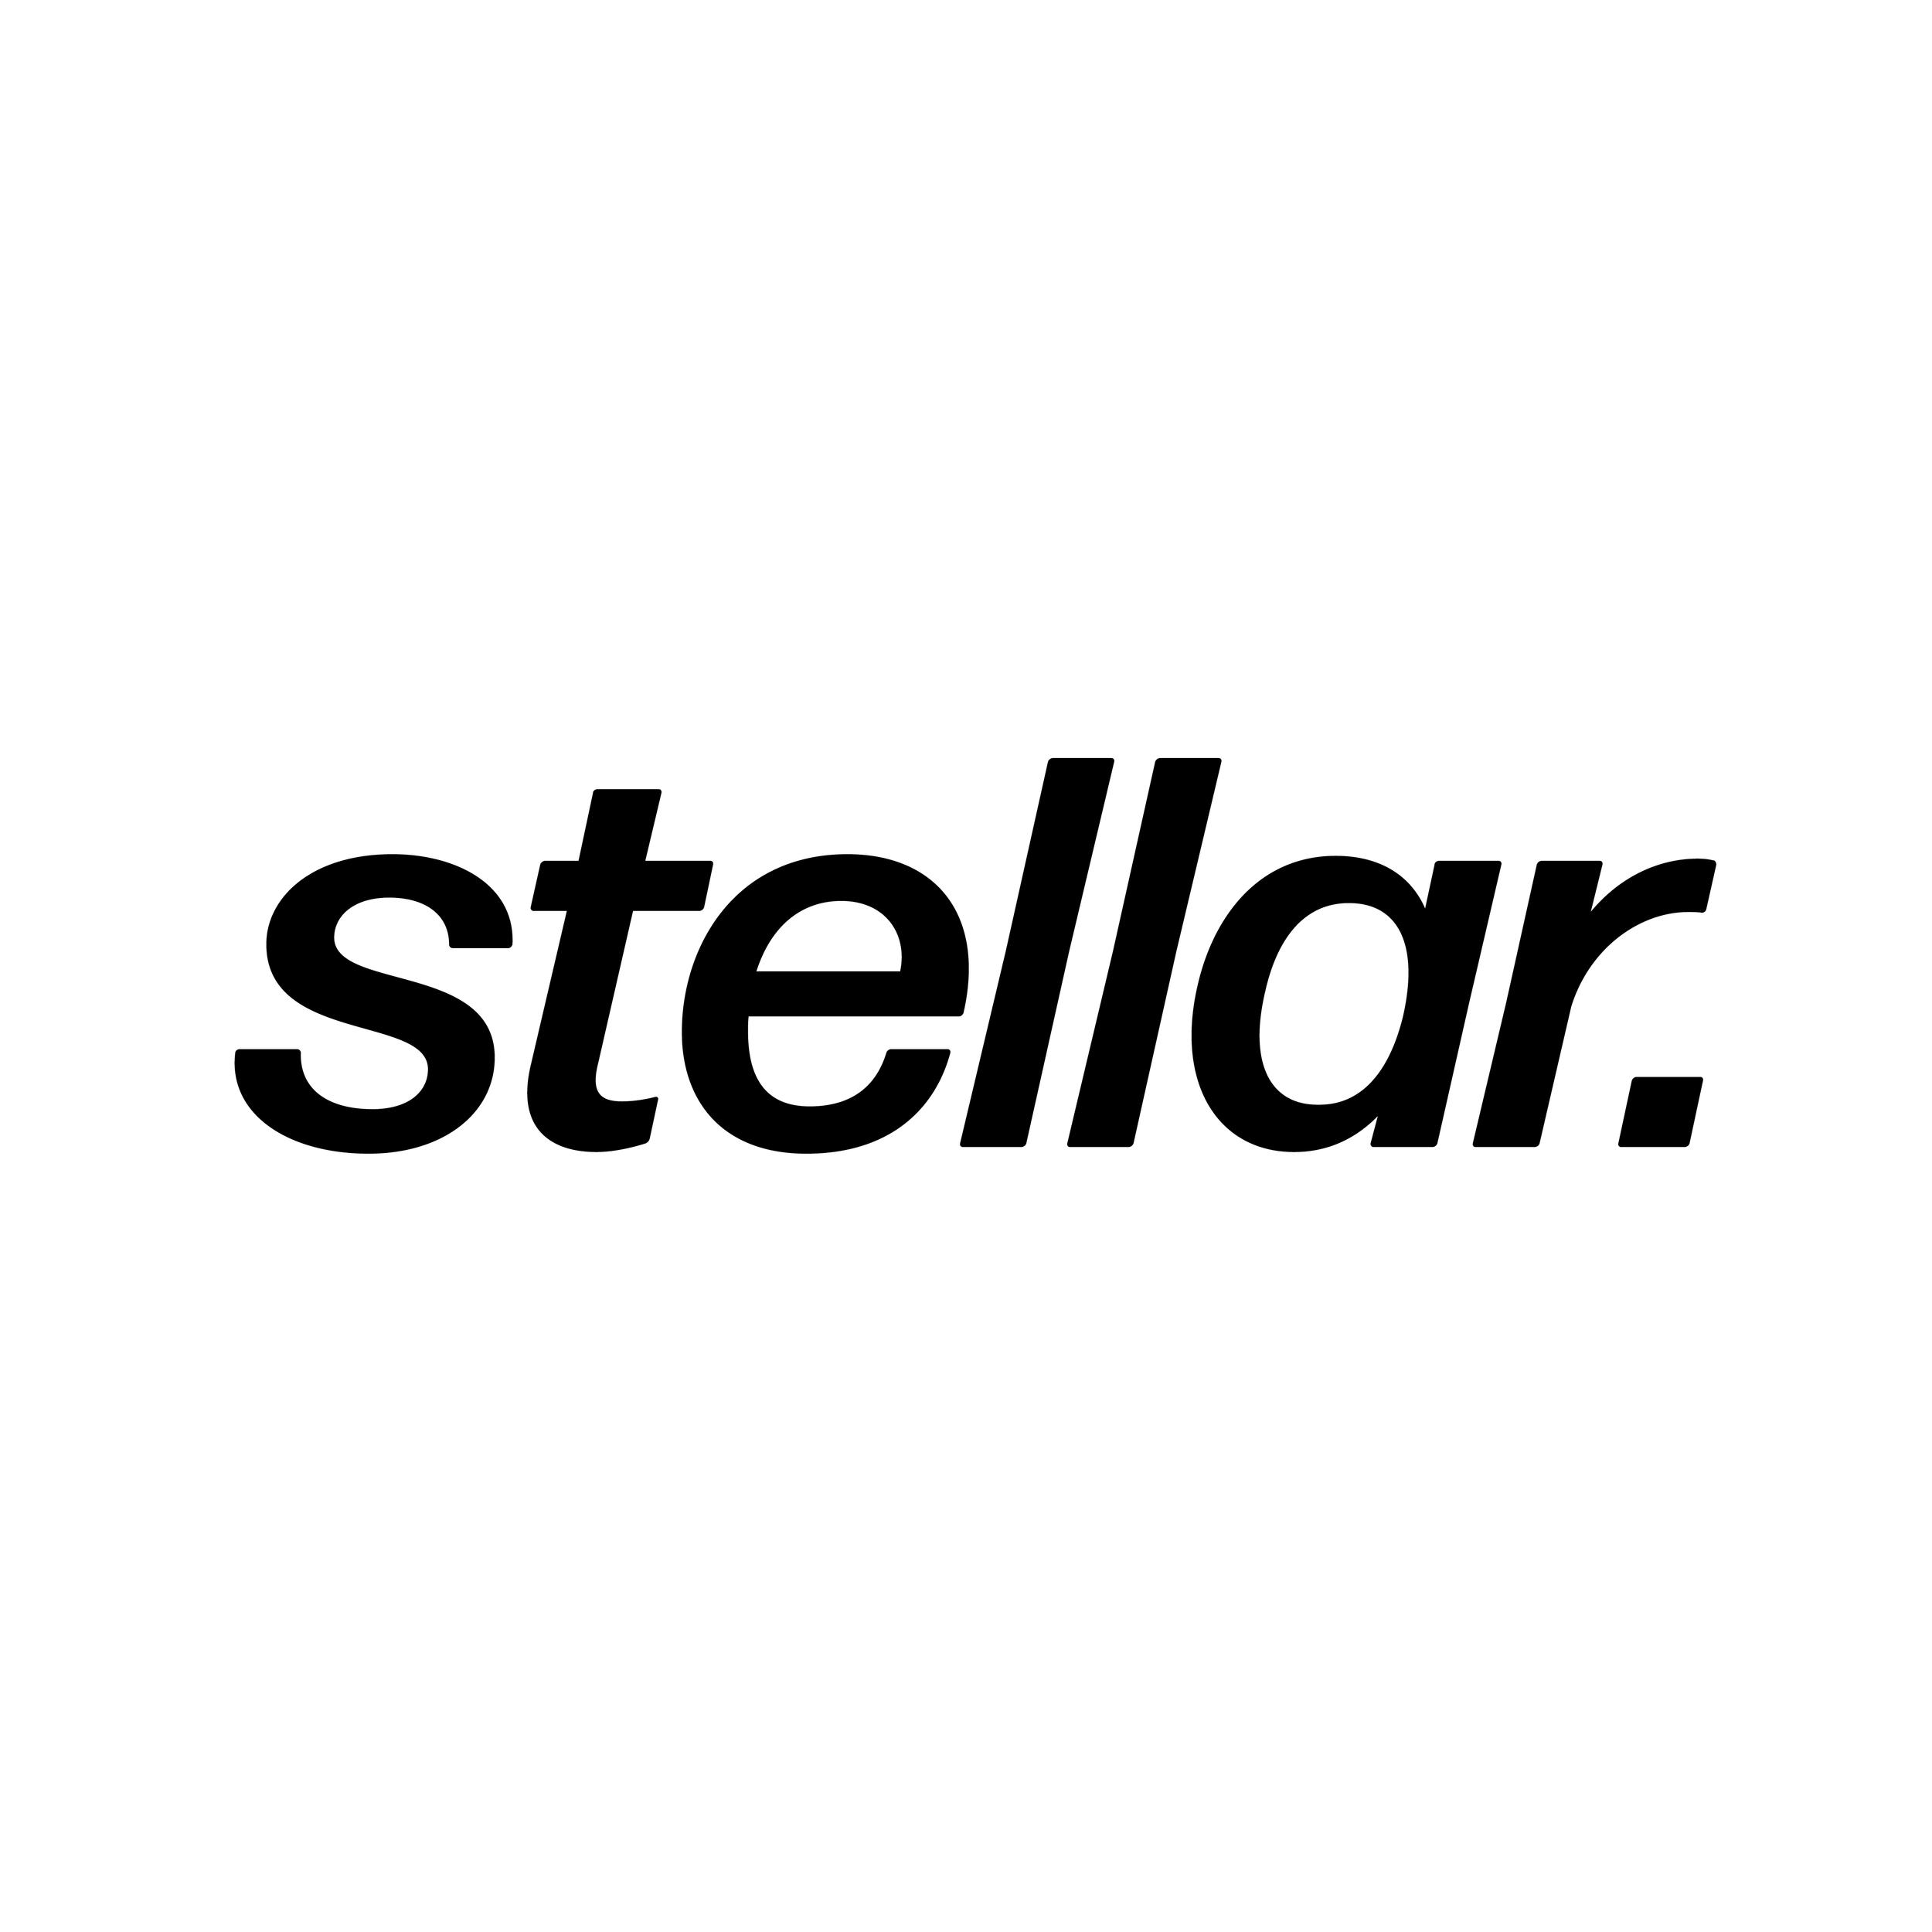 stellar_show-14.png